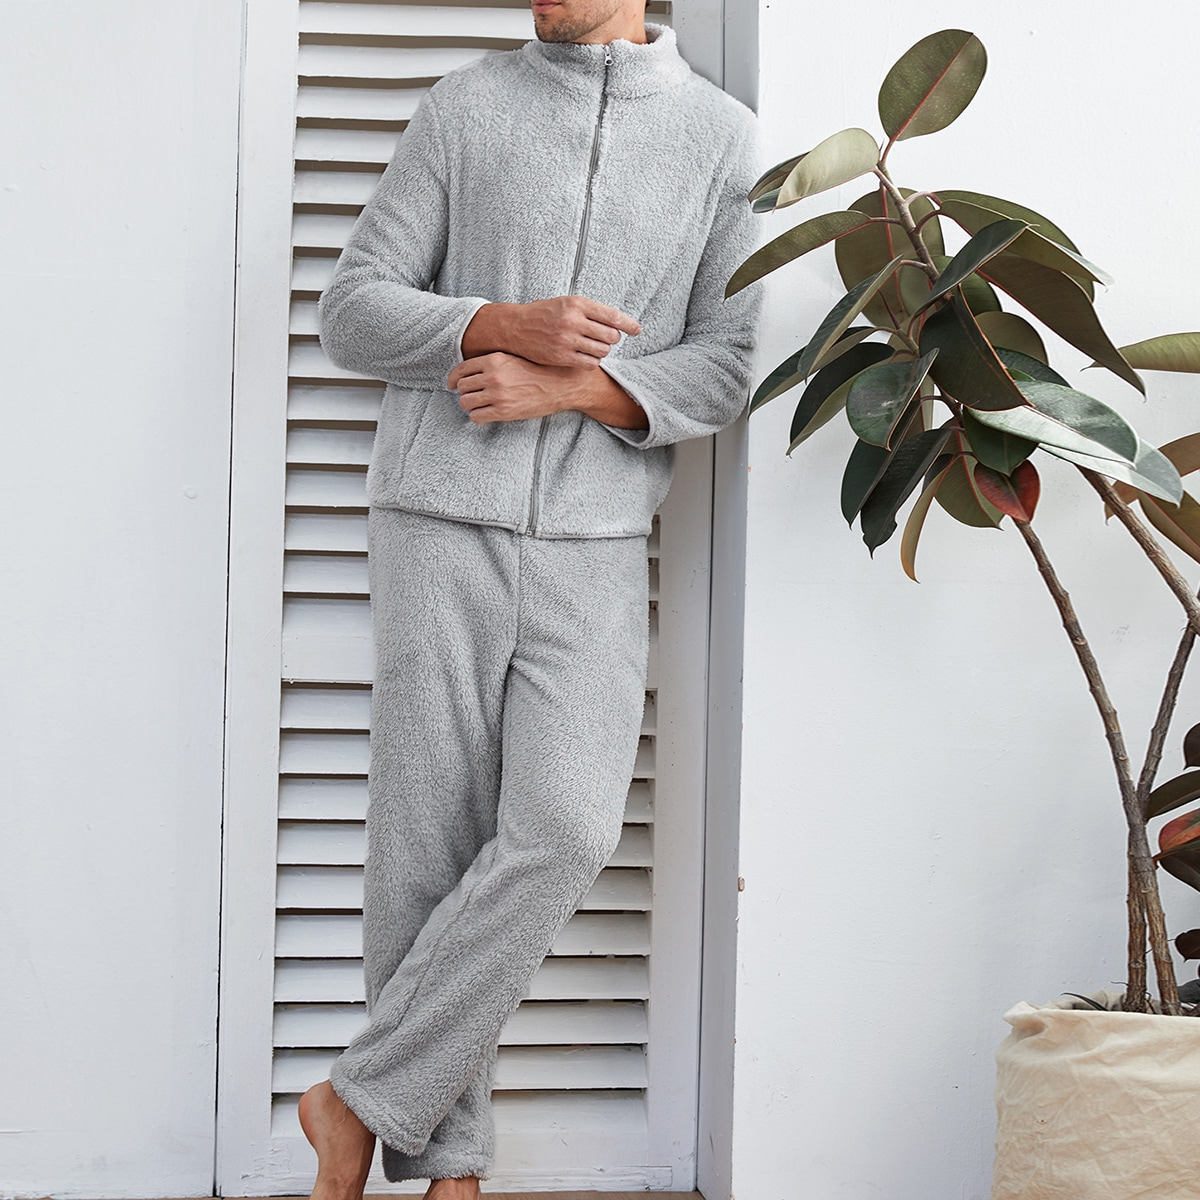 Мужская плюшевая пижама с молнией